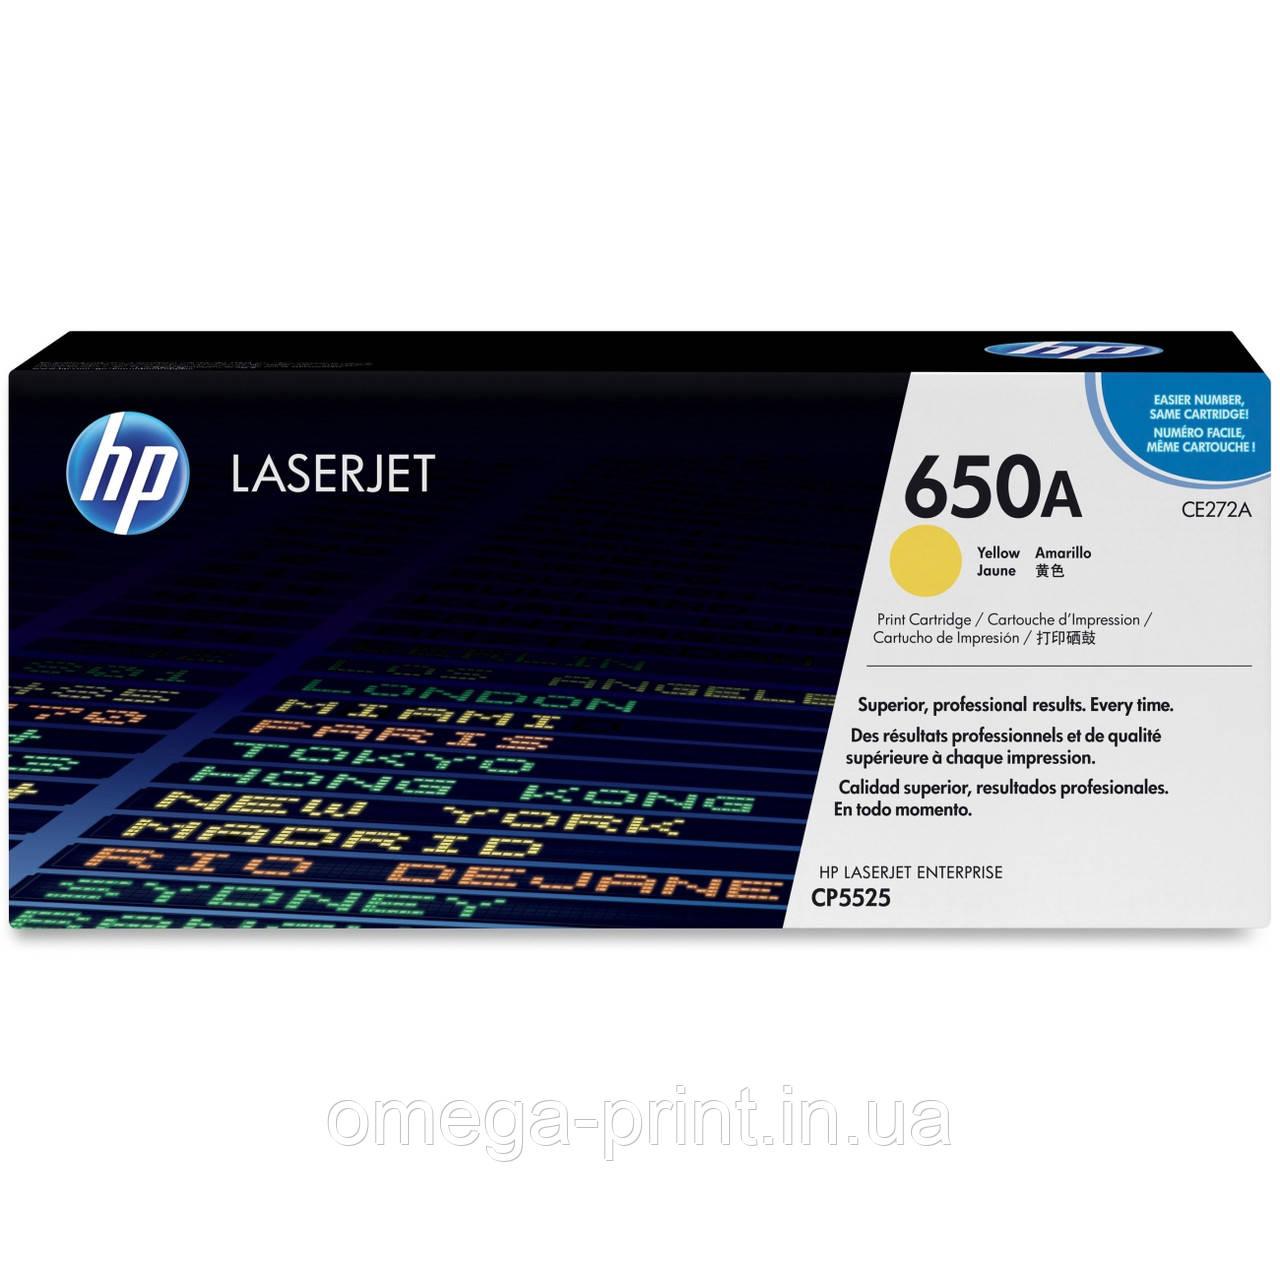 Картридж HP CLJ CP5525, (CE272A/650A), Yellow